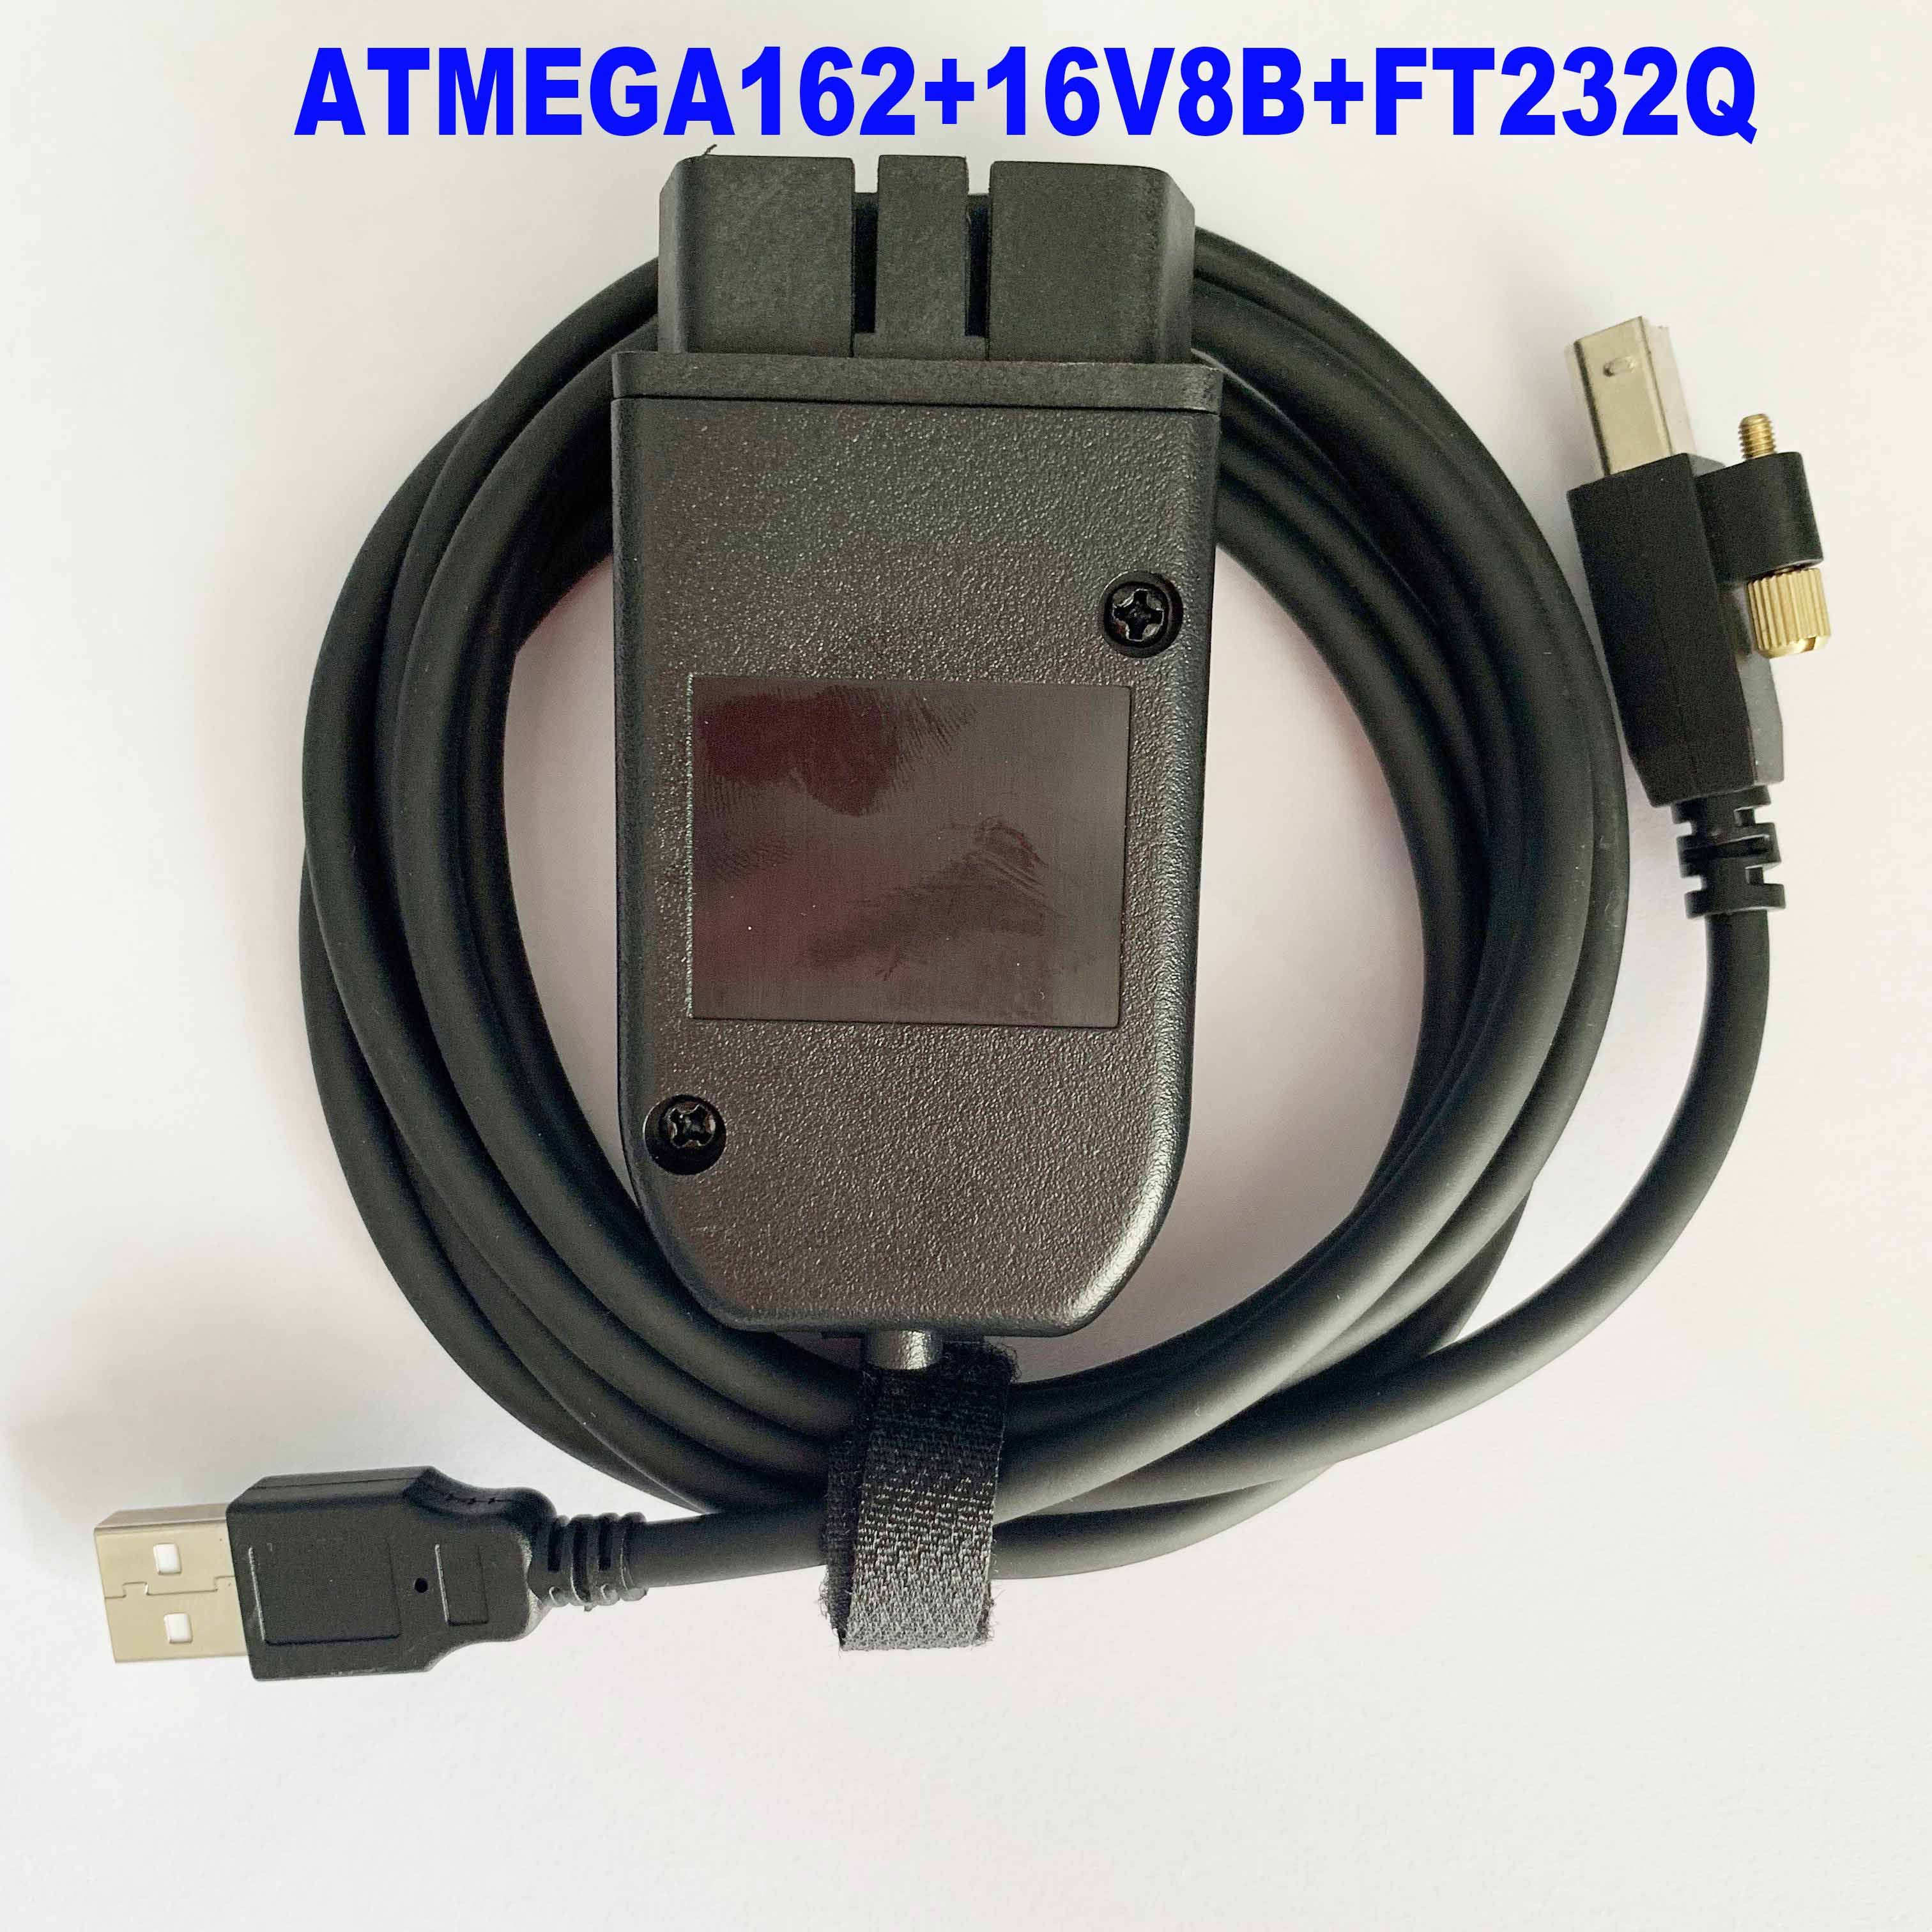 OBD COM Can USB Interface Cable V19.6.2 V2 18.9 19.6.1 OBDII 16pin HEX For Audi Vw Seat Skoda German/Danish/Dutch Multi-Language